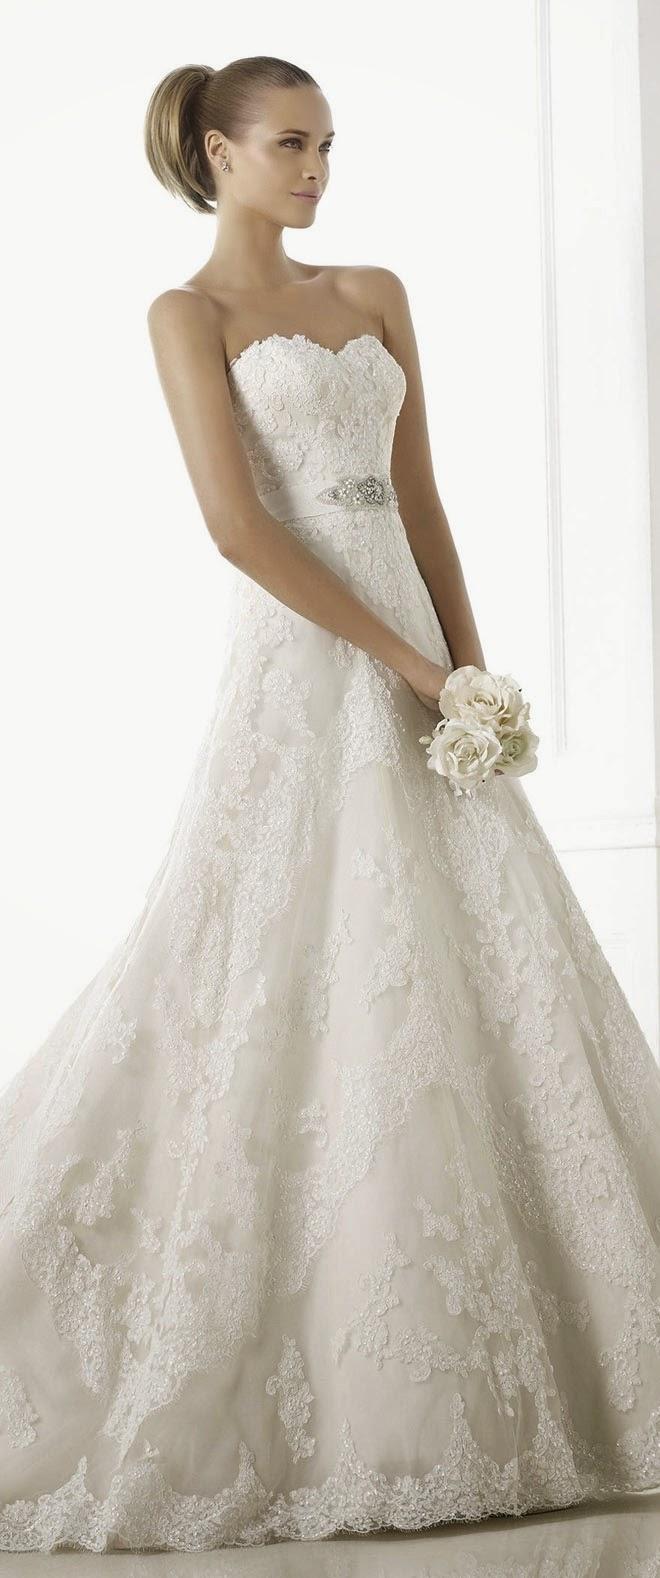 Buy Pronovias Wedding Dress Online 52 Luxury Please contact Pronovias